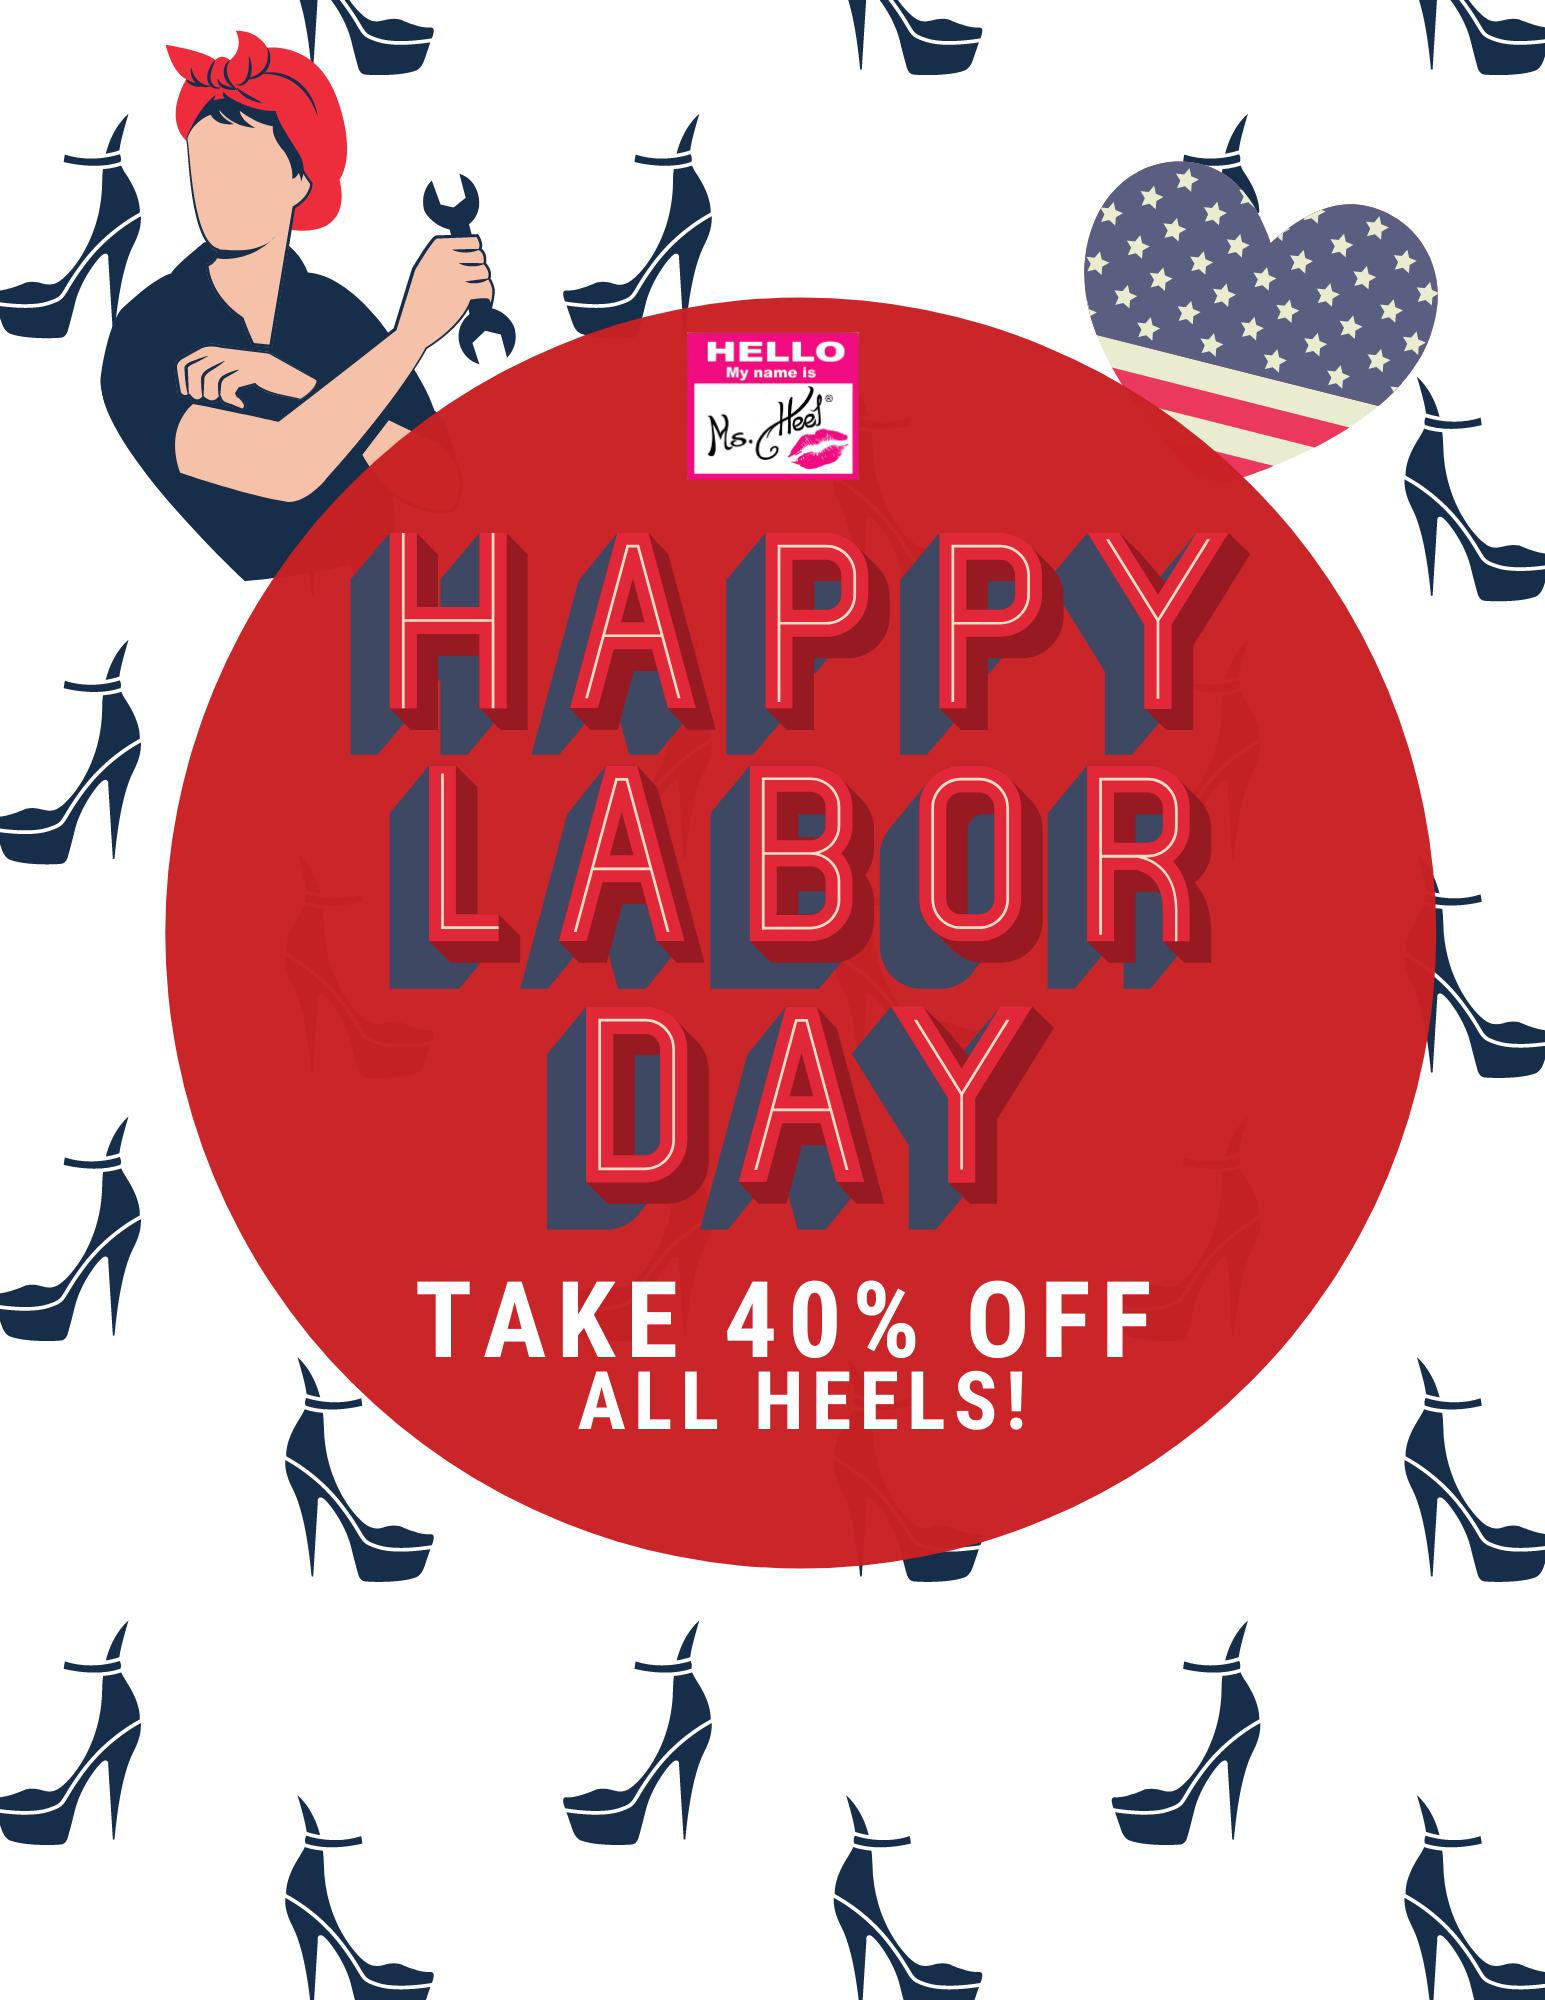 40% off all heels at Ms. Heel Magazine!